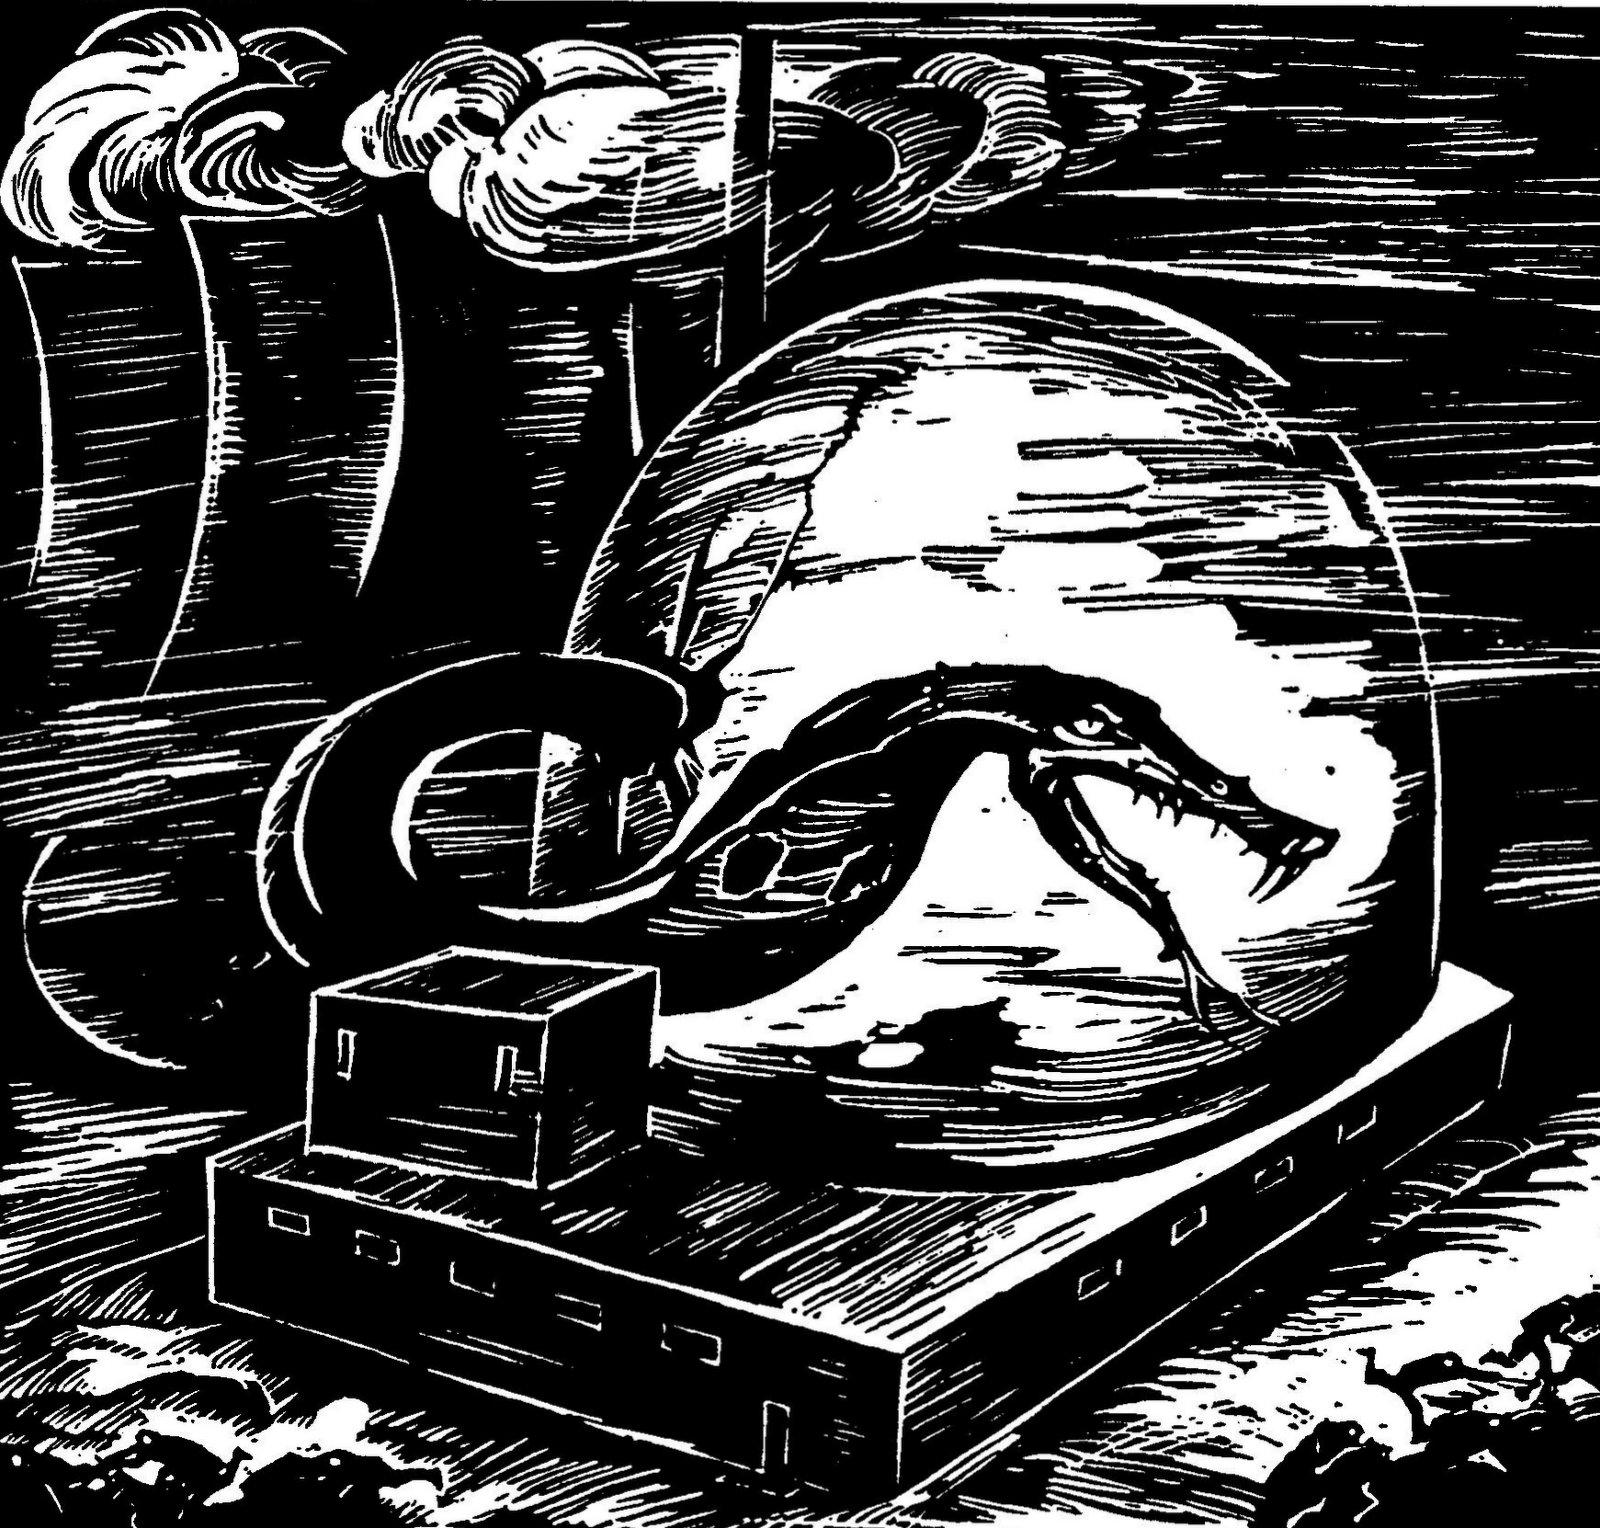 rudolf warnecke schwarz weiss grafik defekter atommeiler. Black Bedroom Furniture Sets. Home Design Ideas